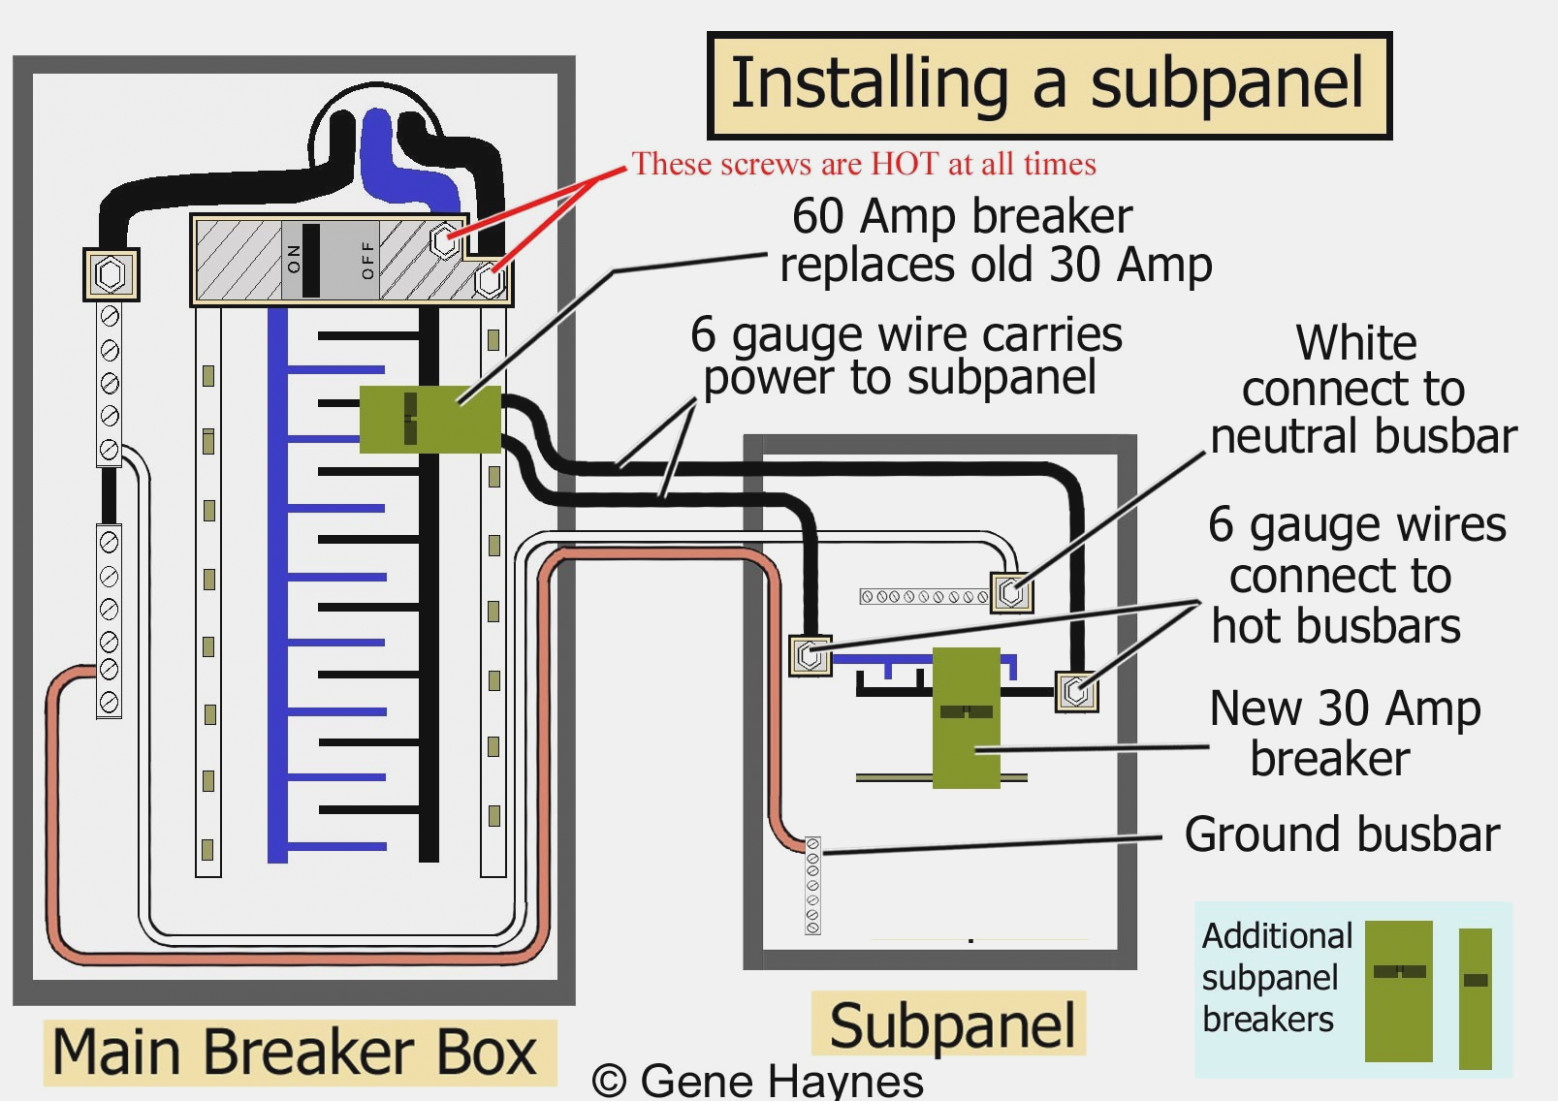 Square D 100 Amp Panel Wiring Diagram | Wiring Diagram - Square D 100 Amp Panel Wiring Diagram